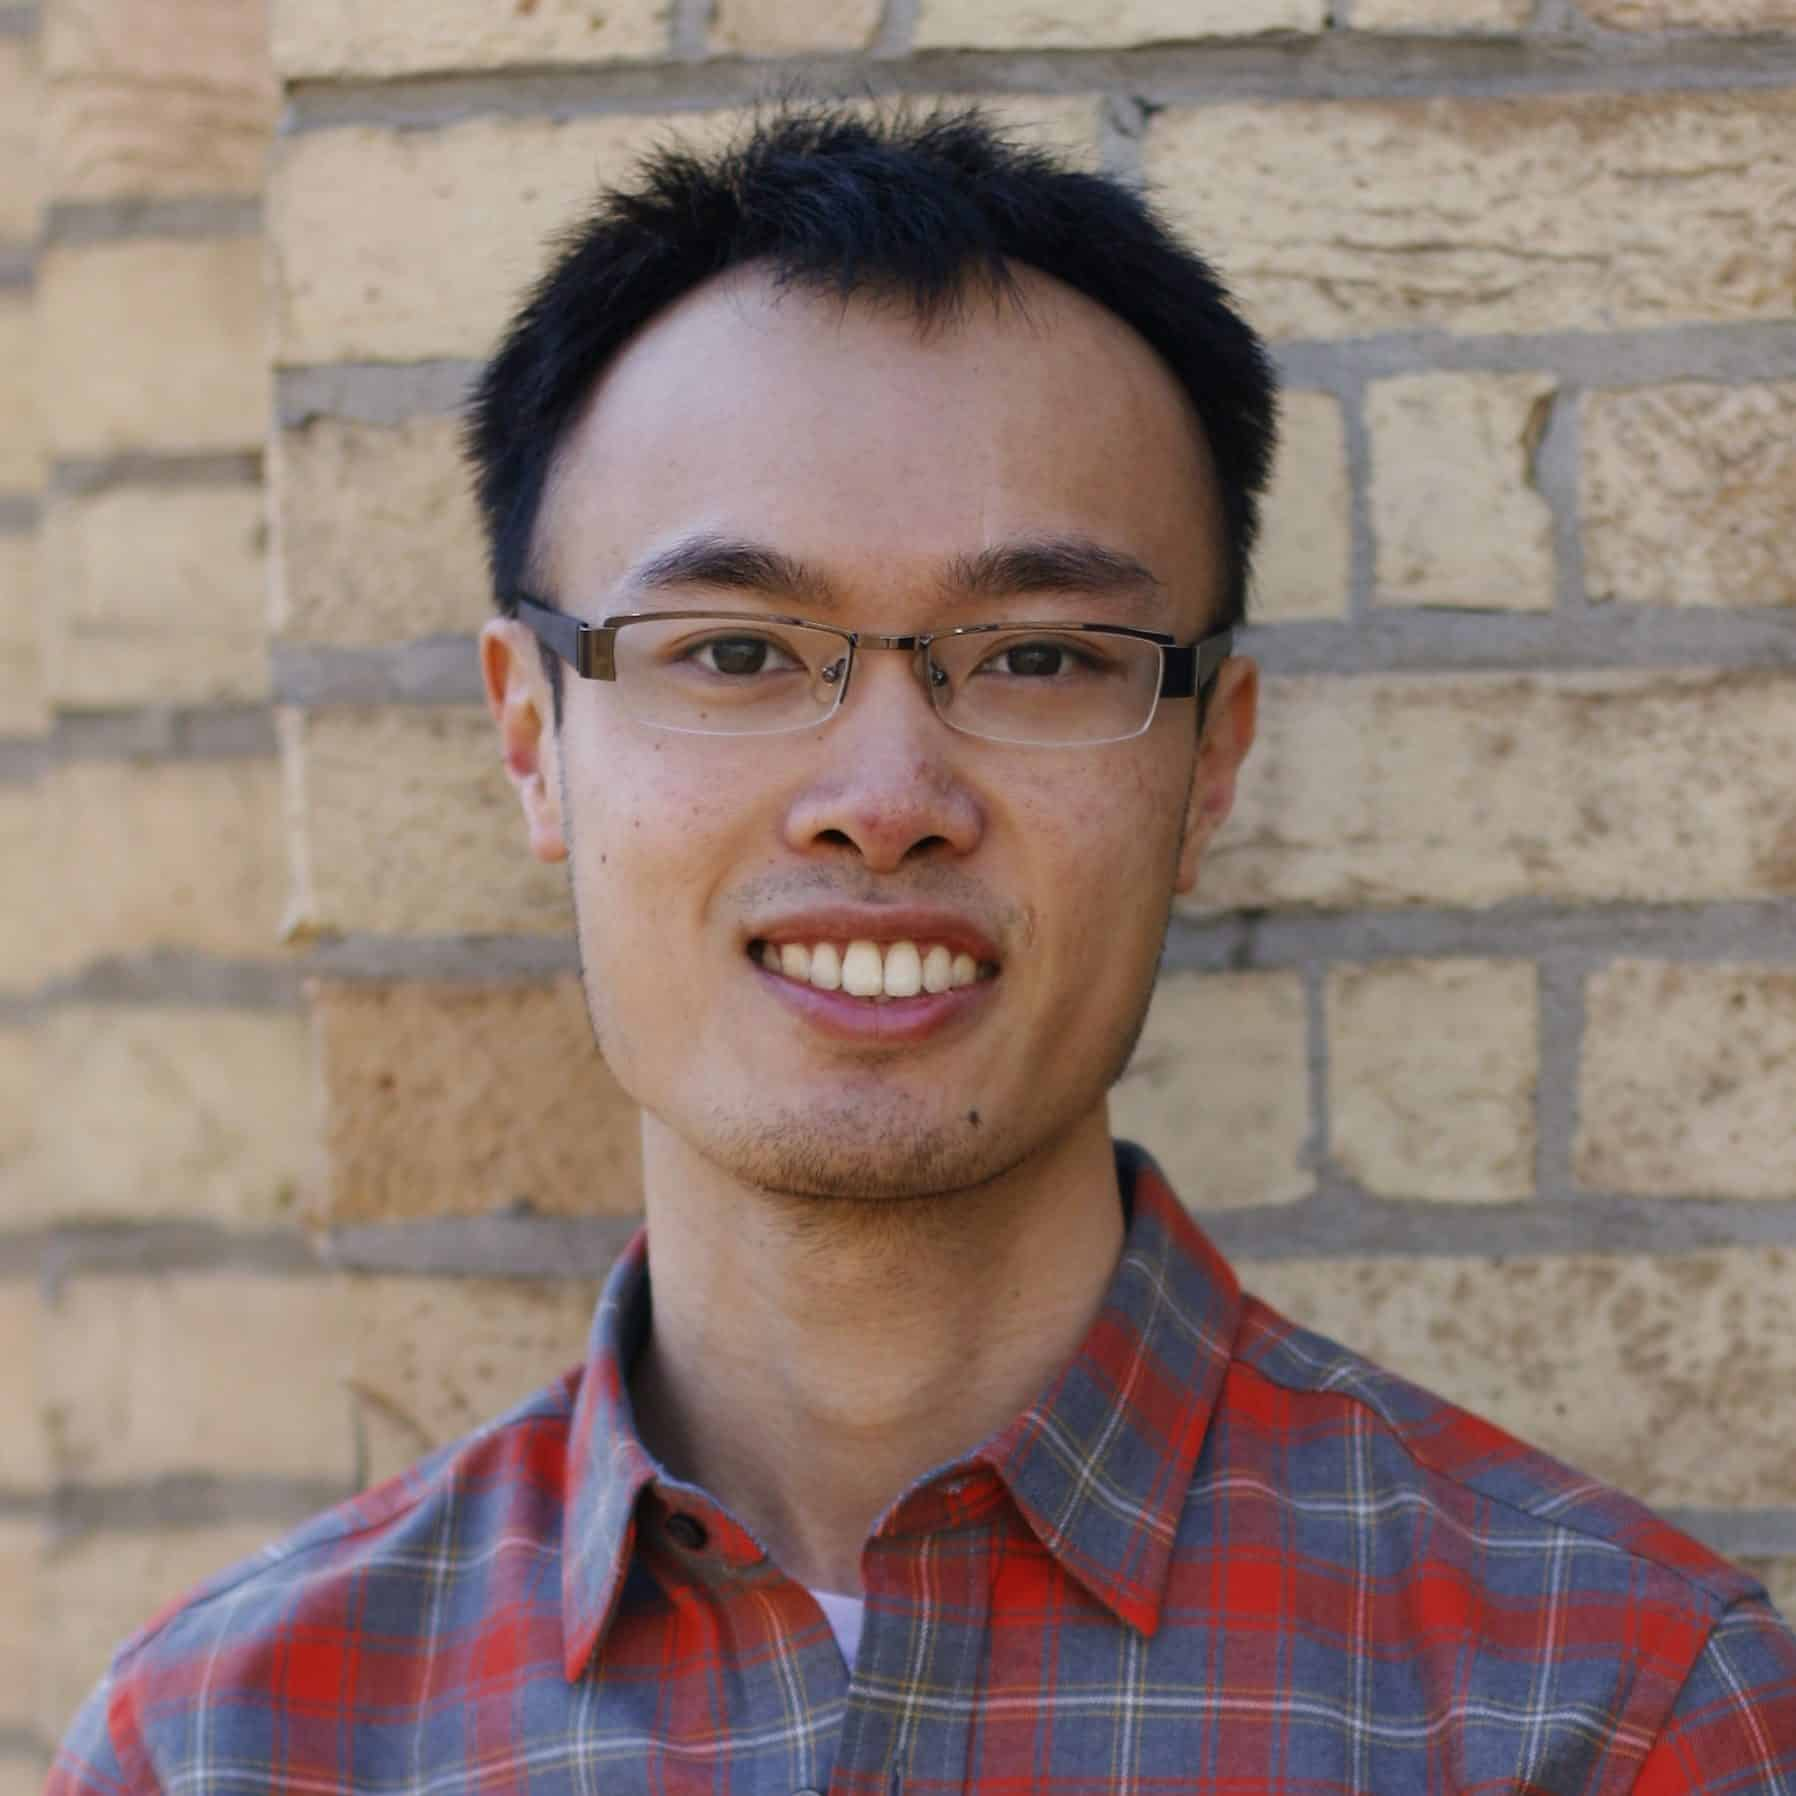 Leo Chau Physiotherapist at Toronto Physiotherapy